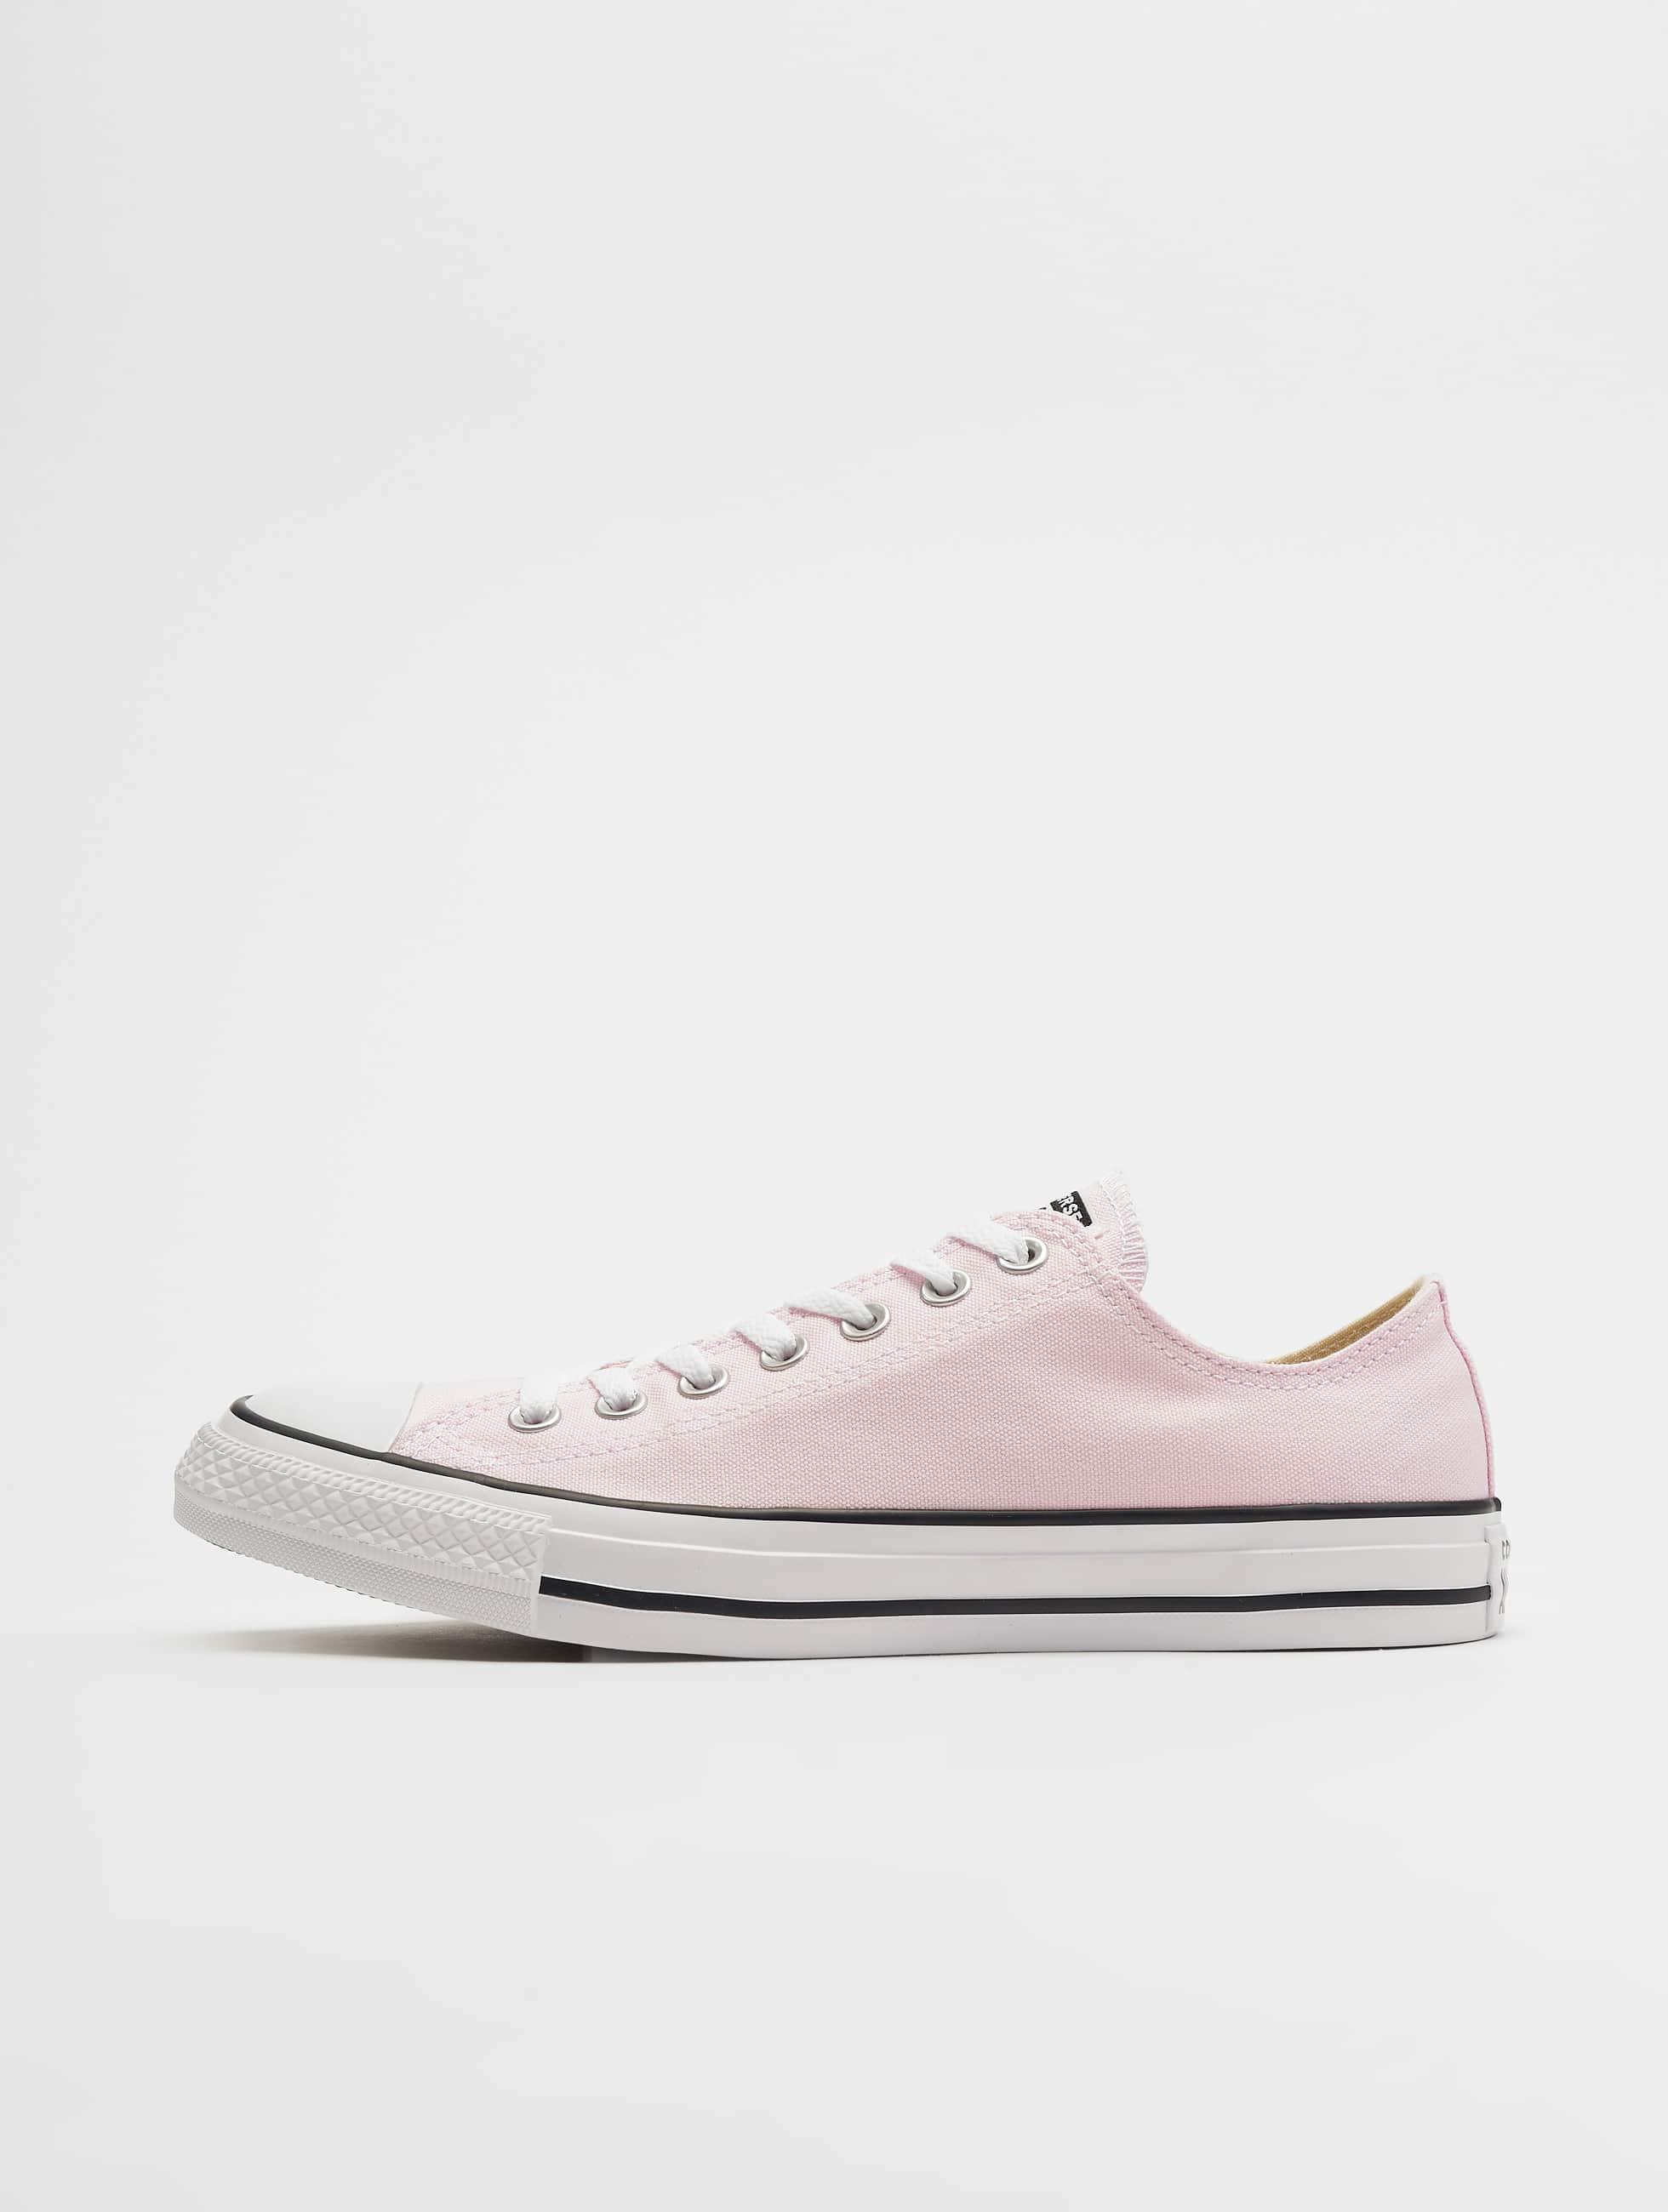 cc2494b9932 Converse schoen / sneaker Chuck Taylor All Star Ox in rose 629751